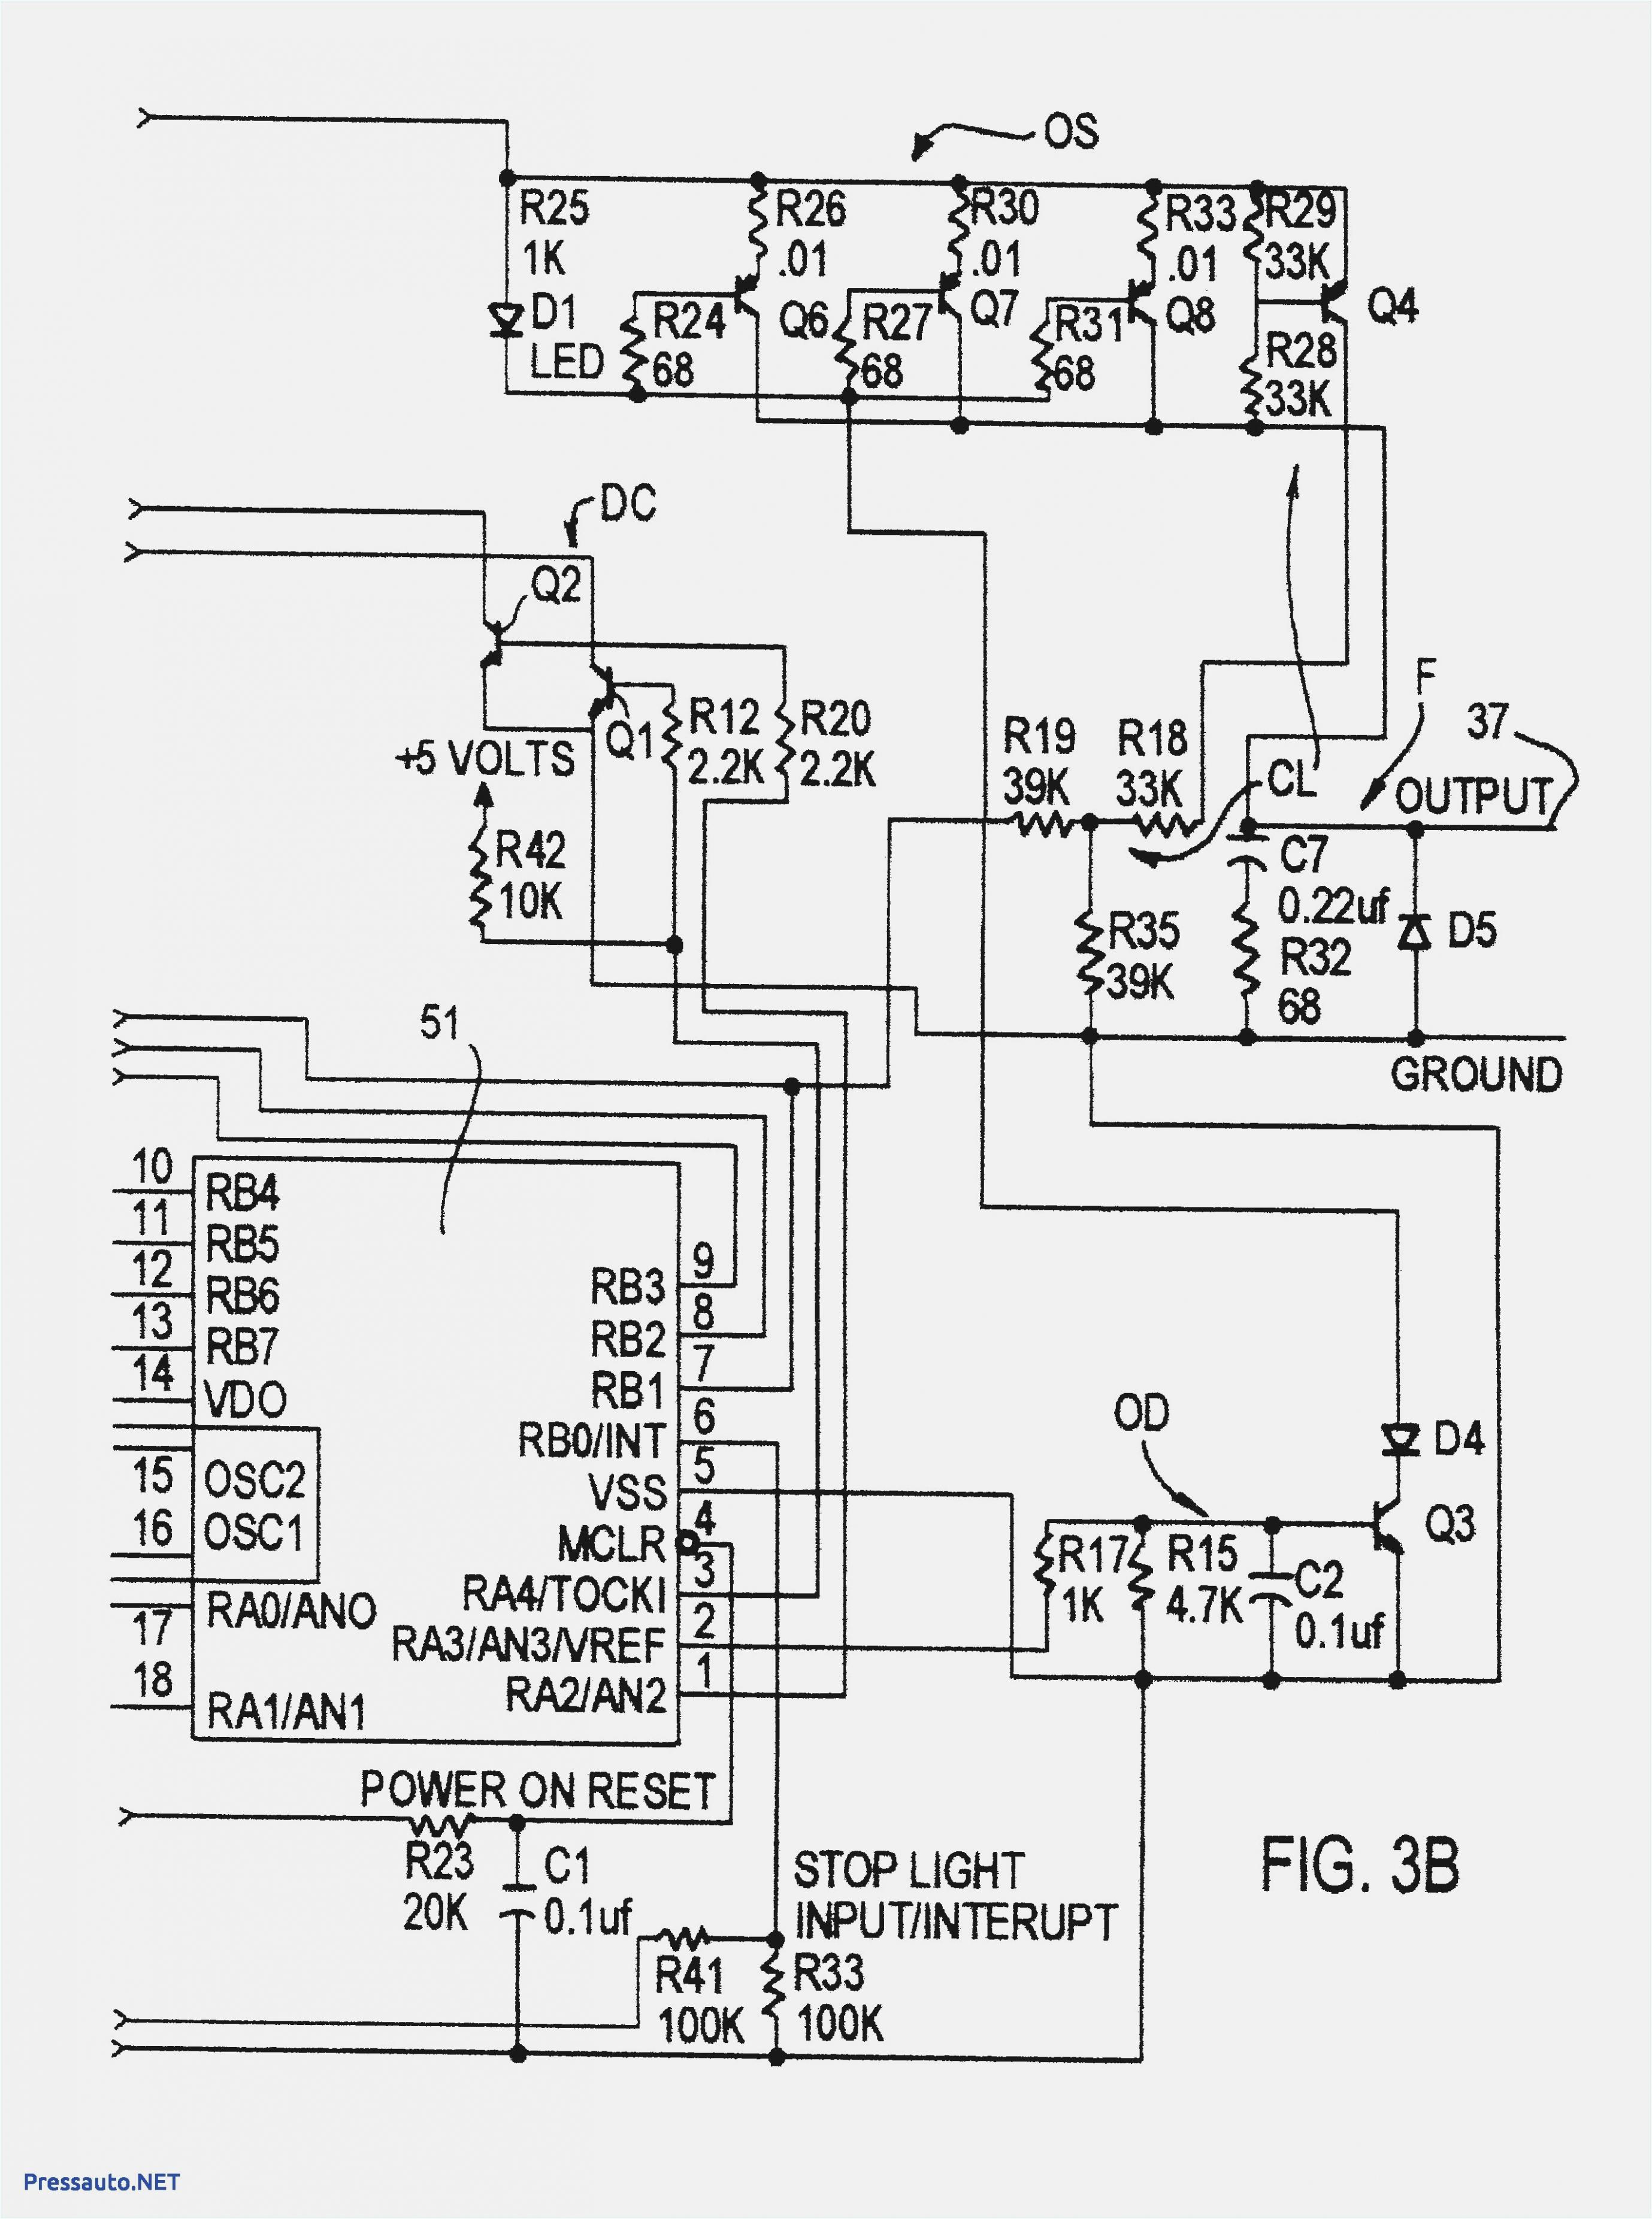 powerflite wiring diagram data schematic diagram chrysler imperial diagram door locks 1958 chrysler imperial wiring powerflite